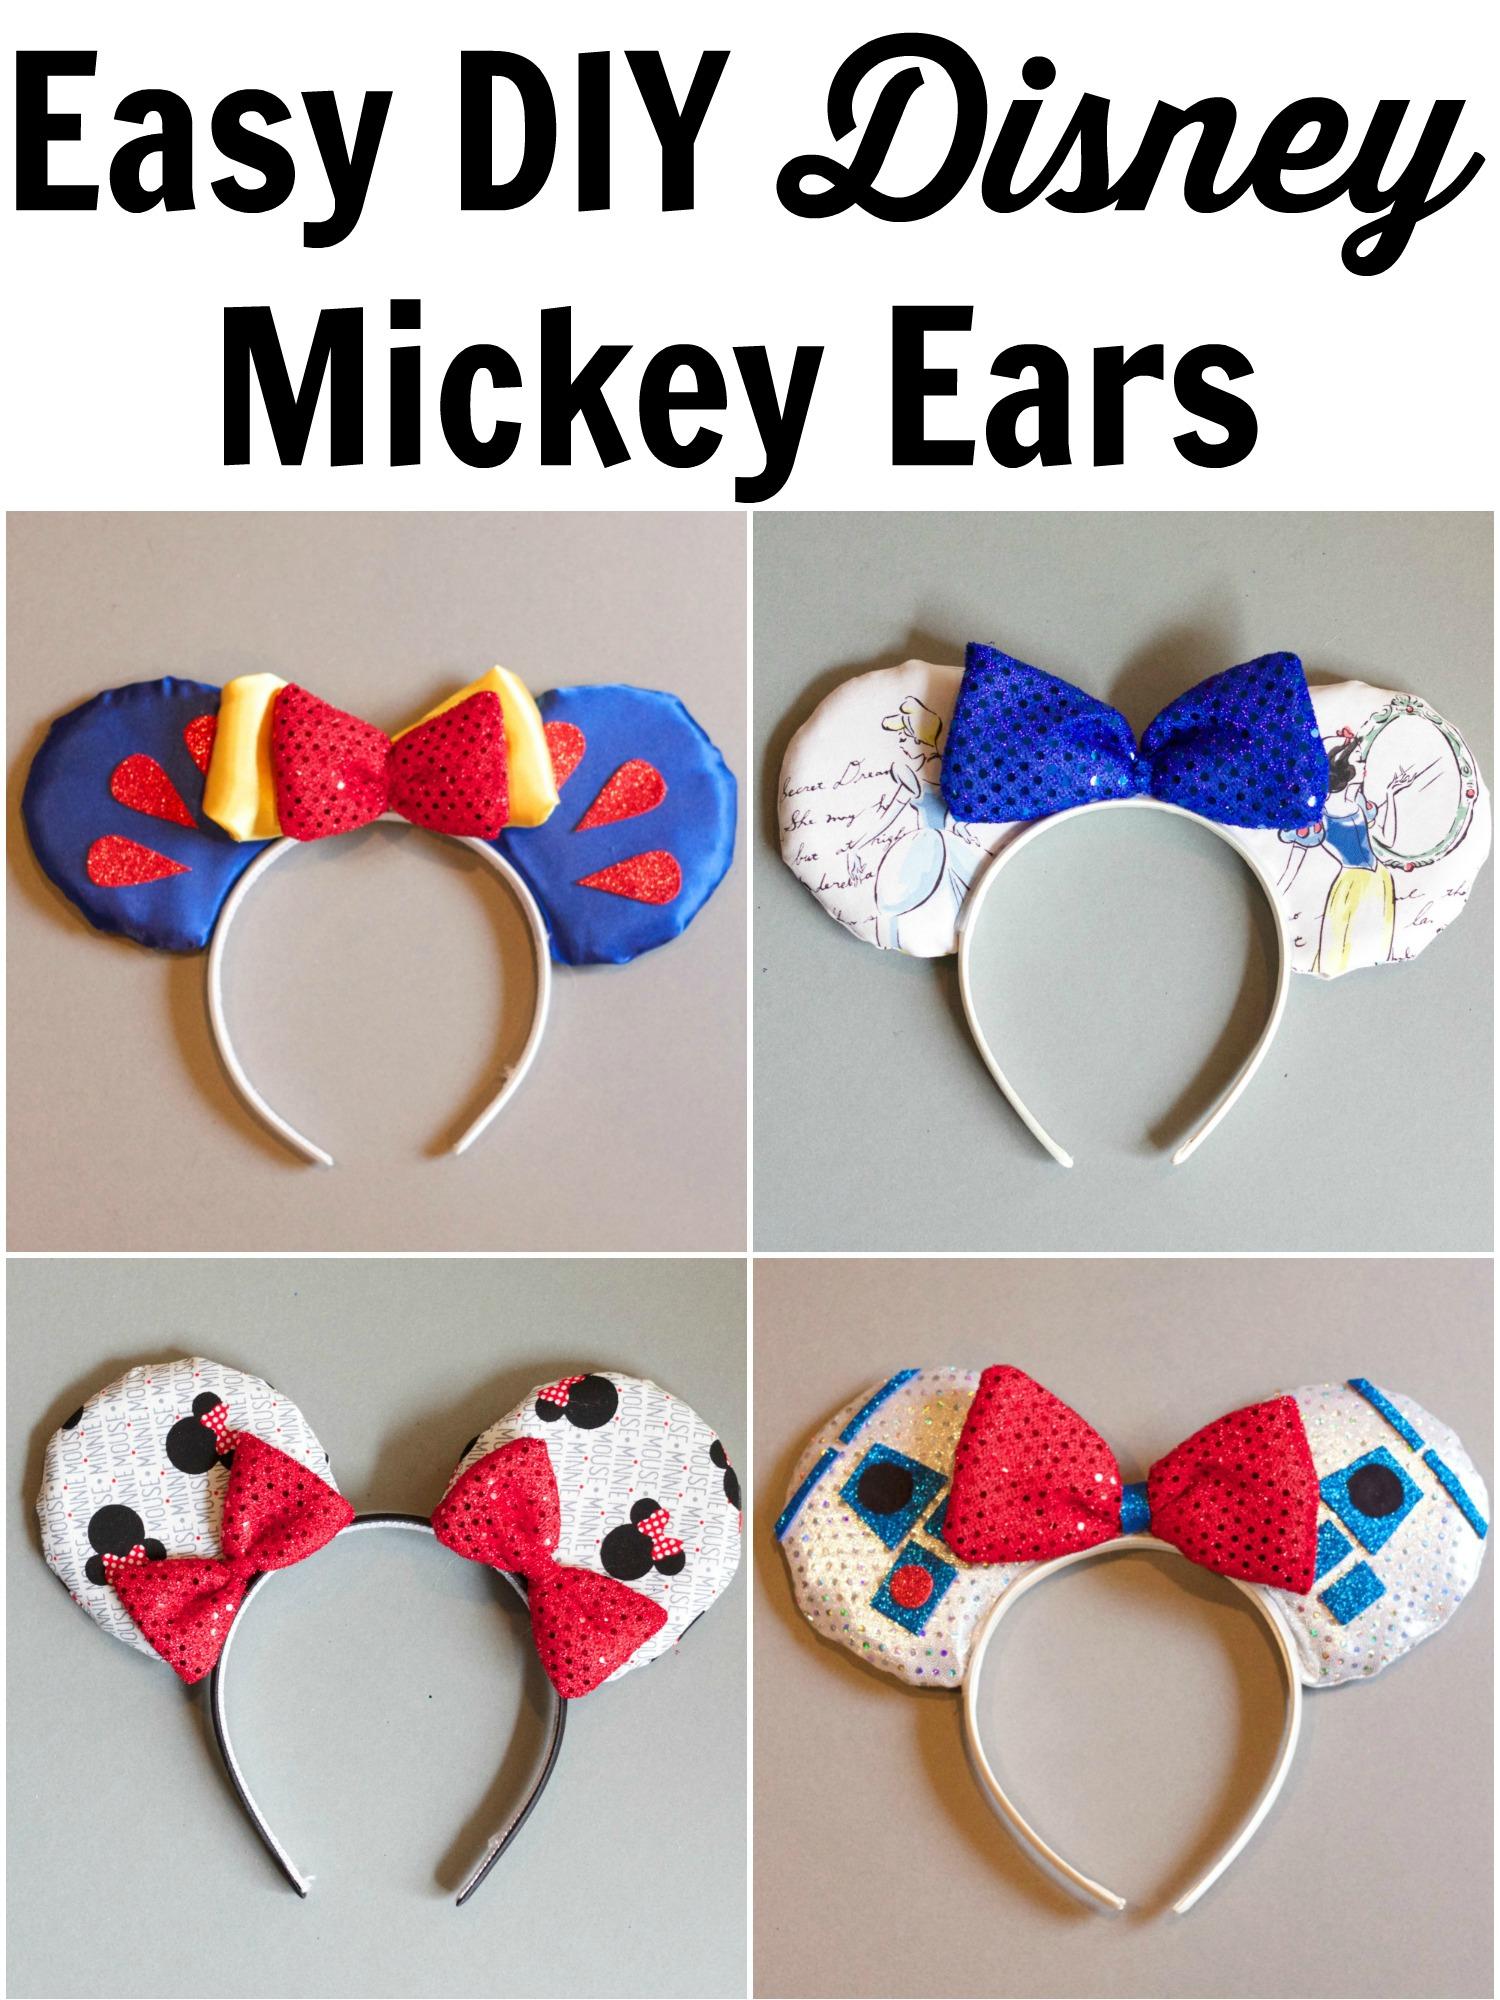 DIY No SEW Mickey Ears